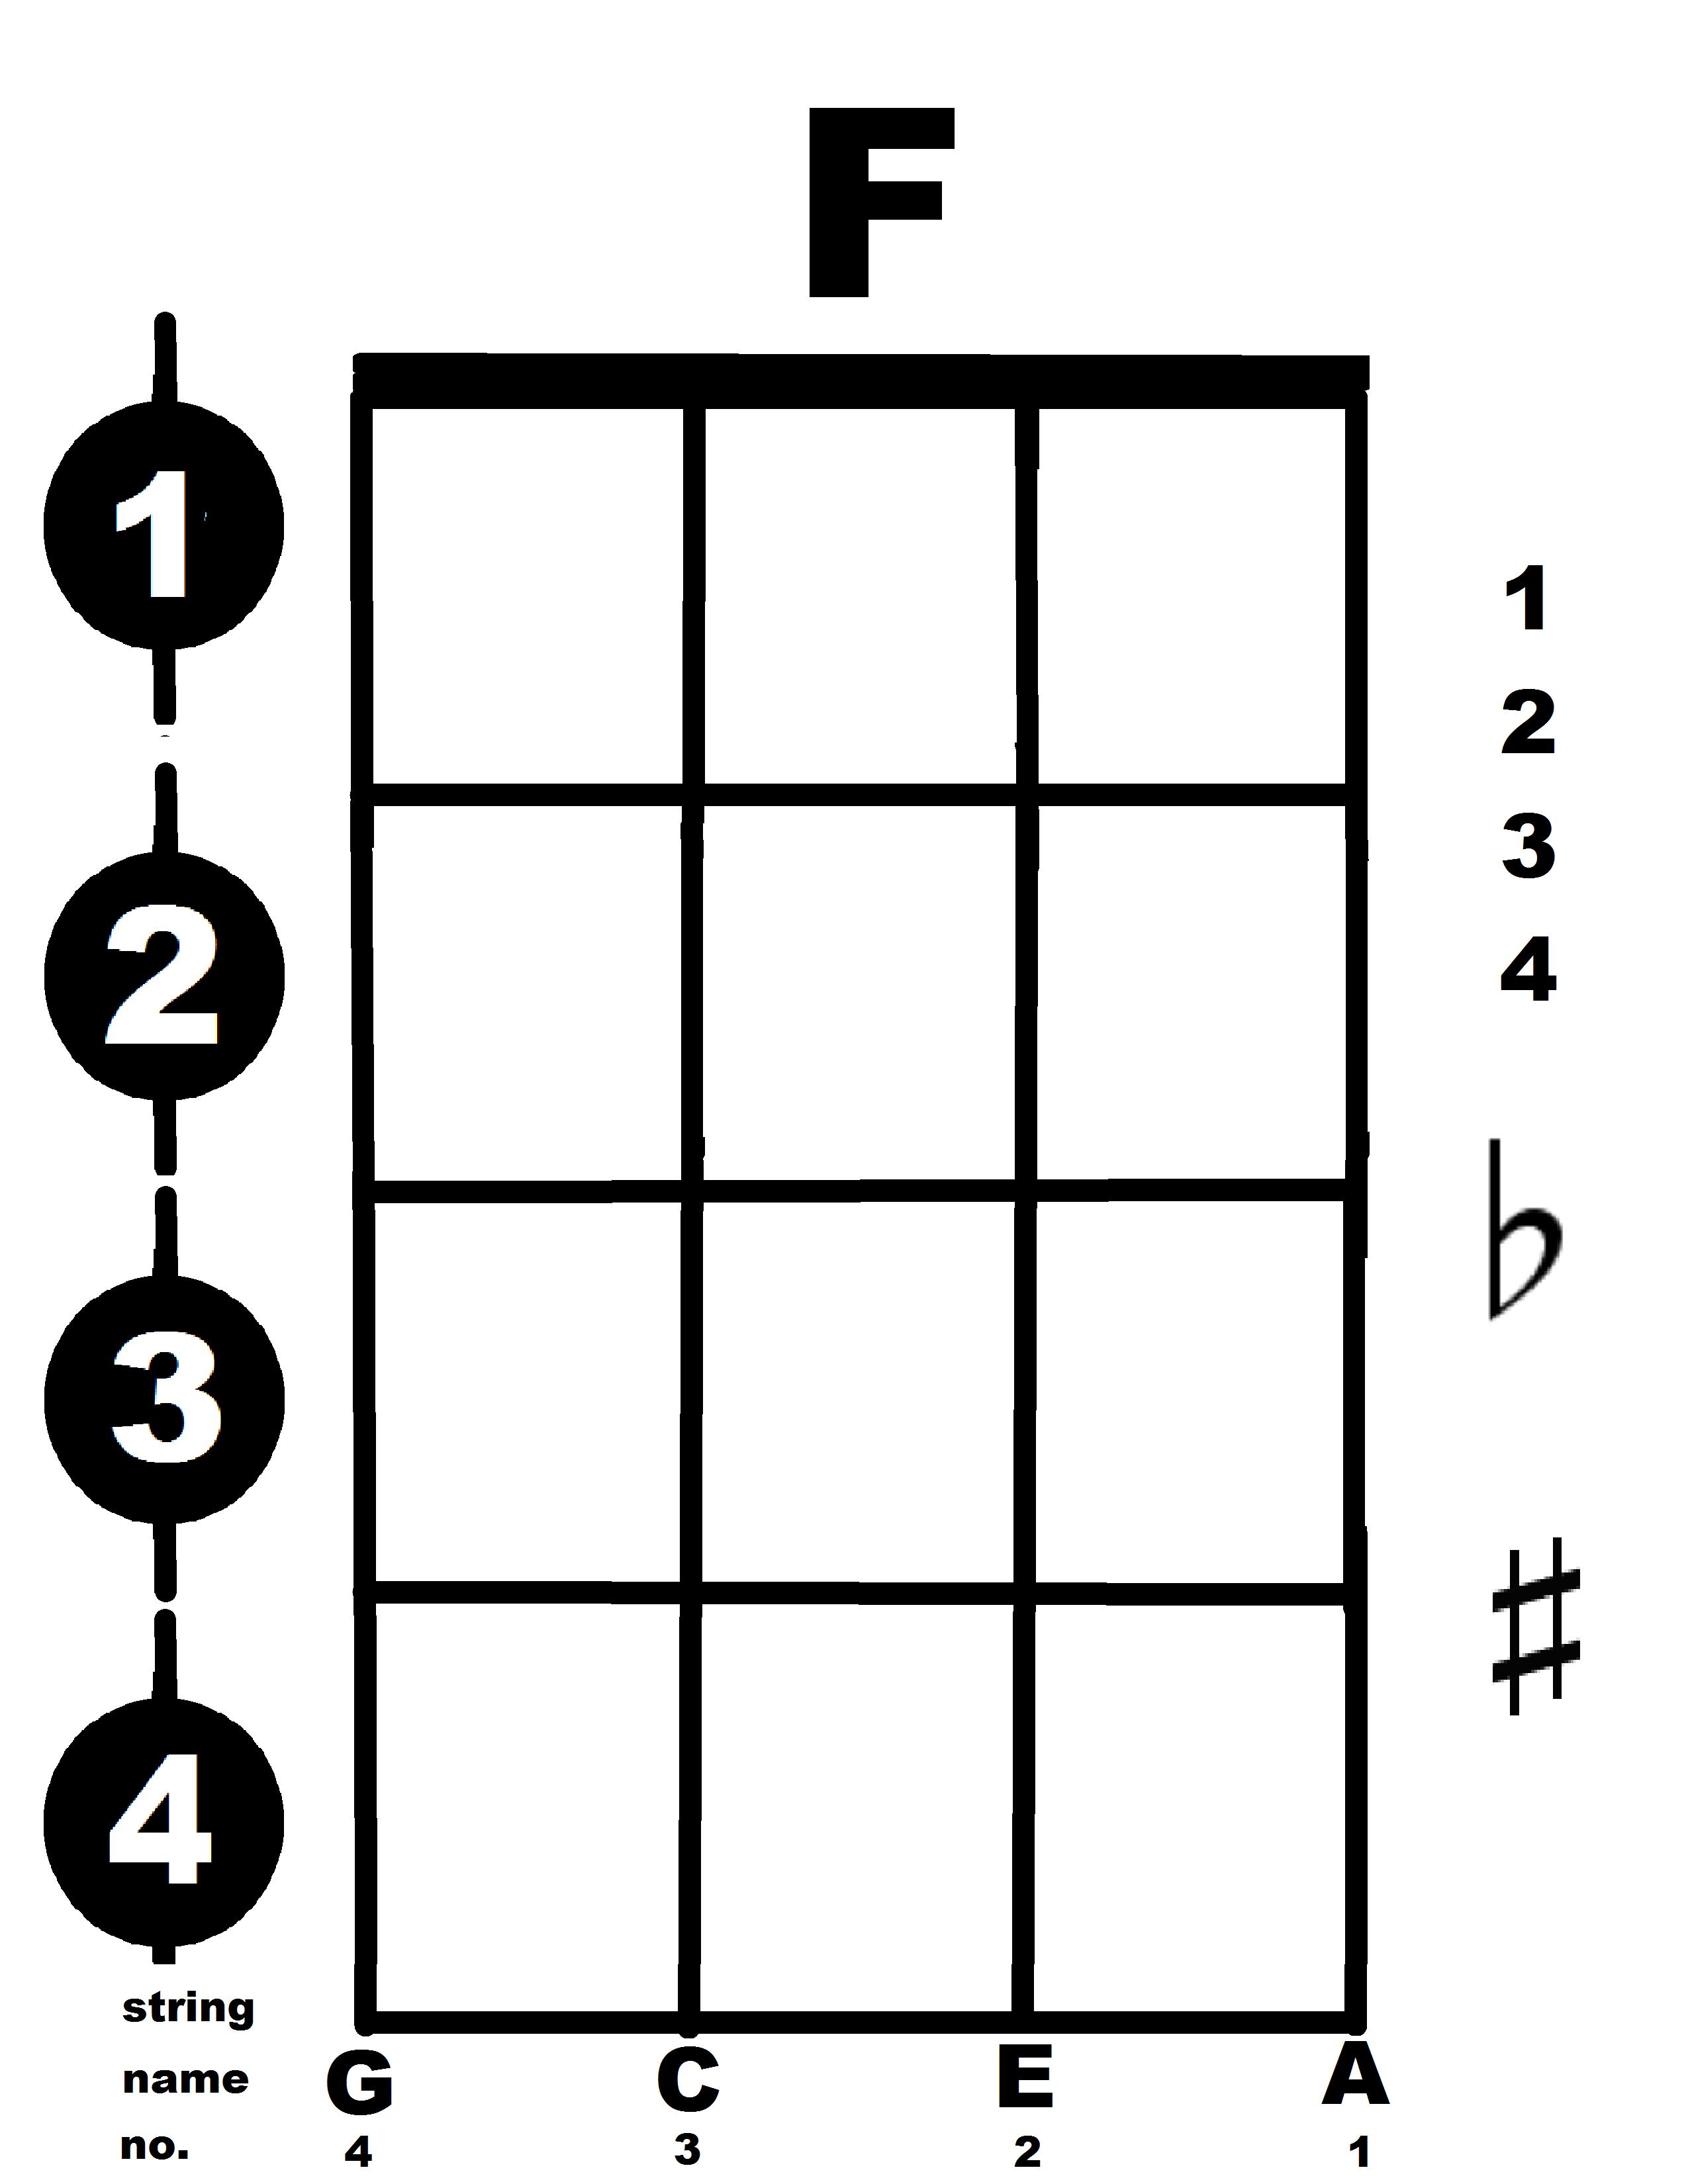 Sun City AZ Ukulele Club - Education A Chord Diagram on